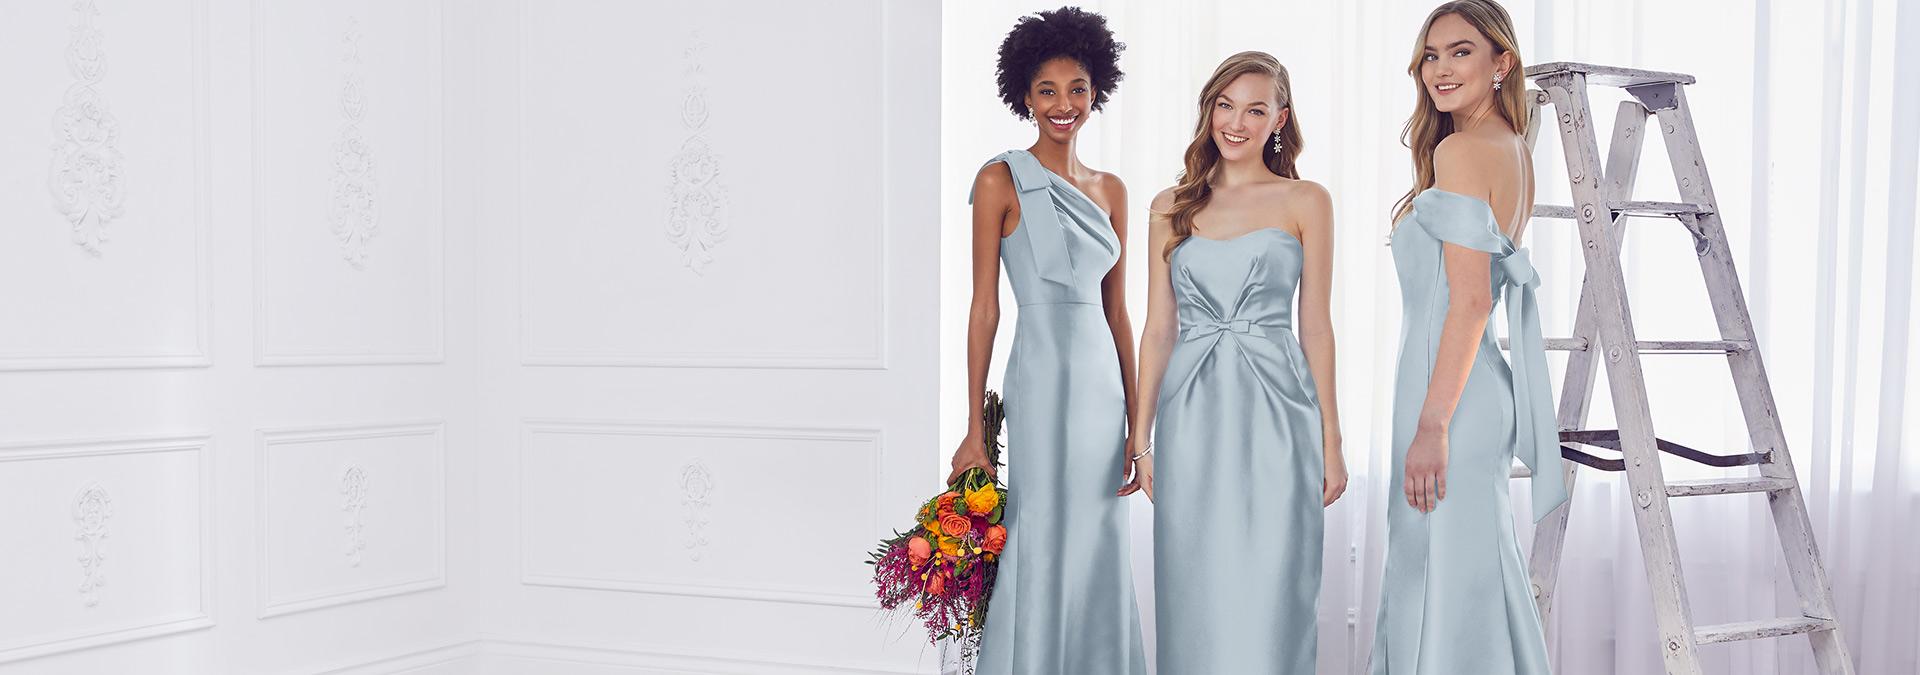 Alfred Sung Bridesmaid Dresses